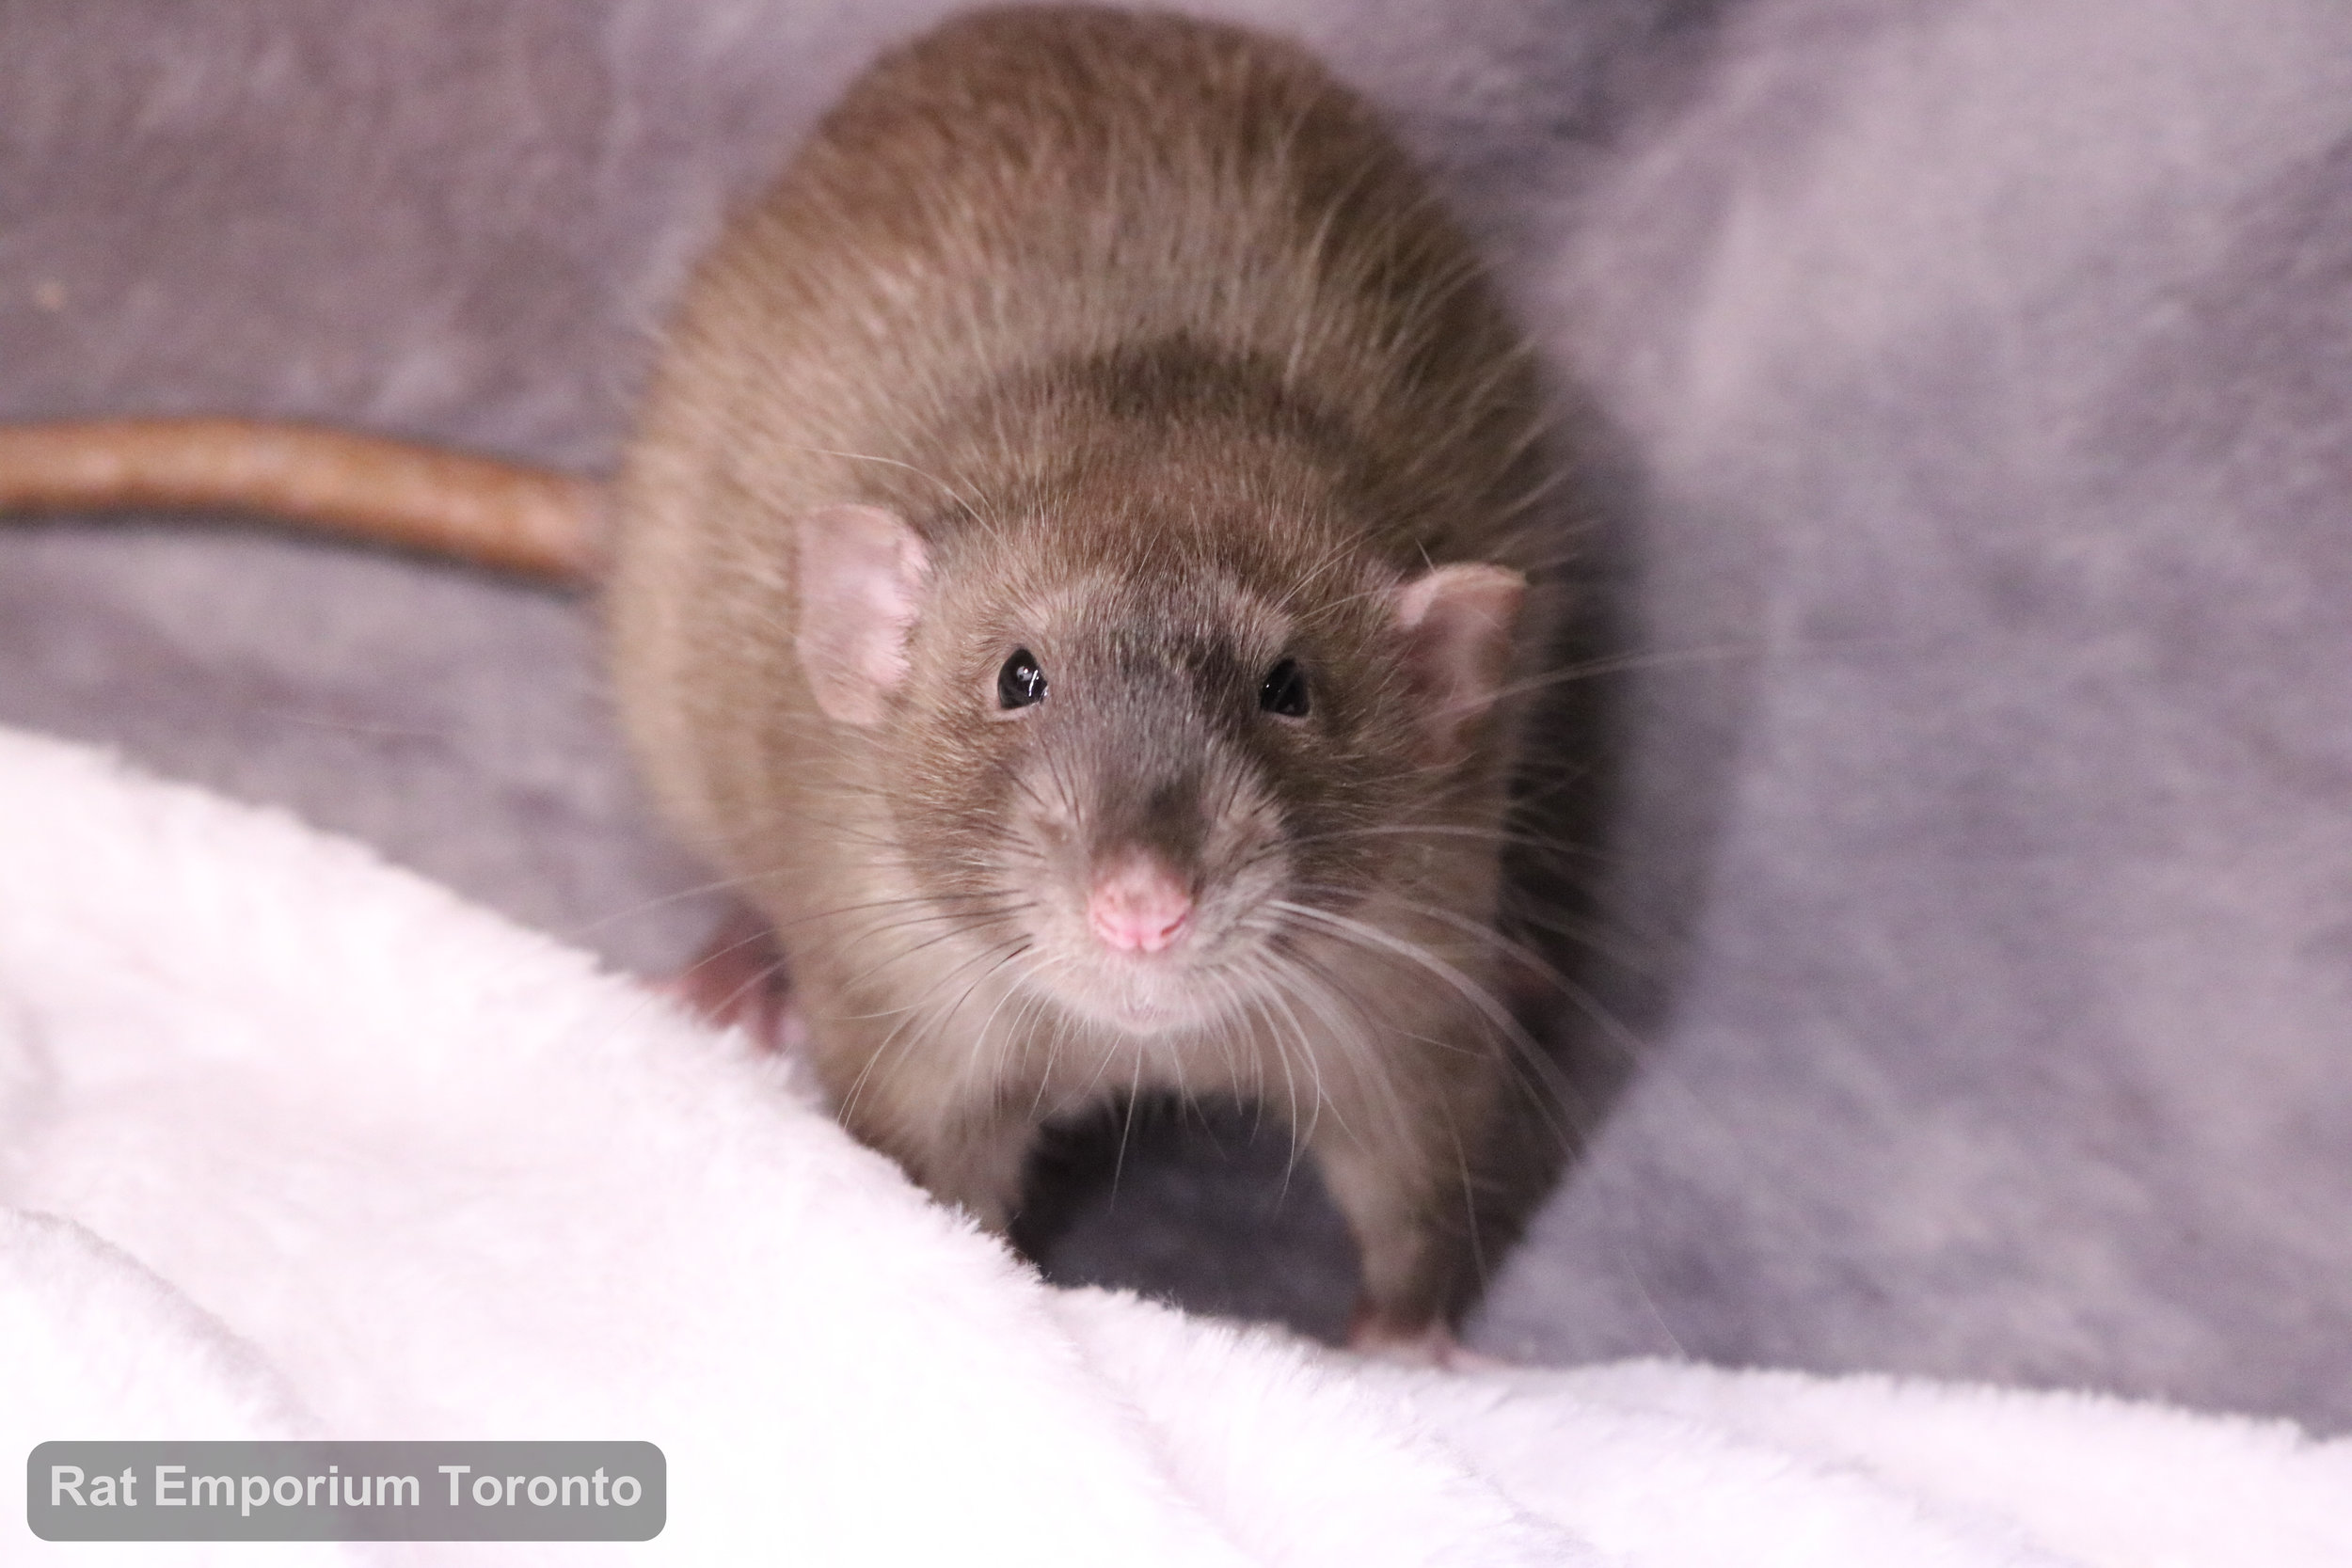 Truffle, my sabledumbo rat - born and raised at the Rat Emporium Toronto - adopt pet rats - rat breeder